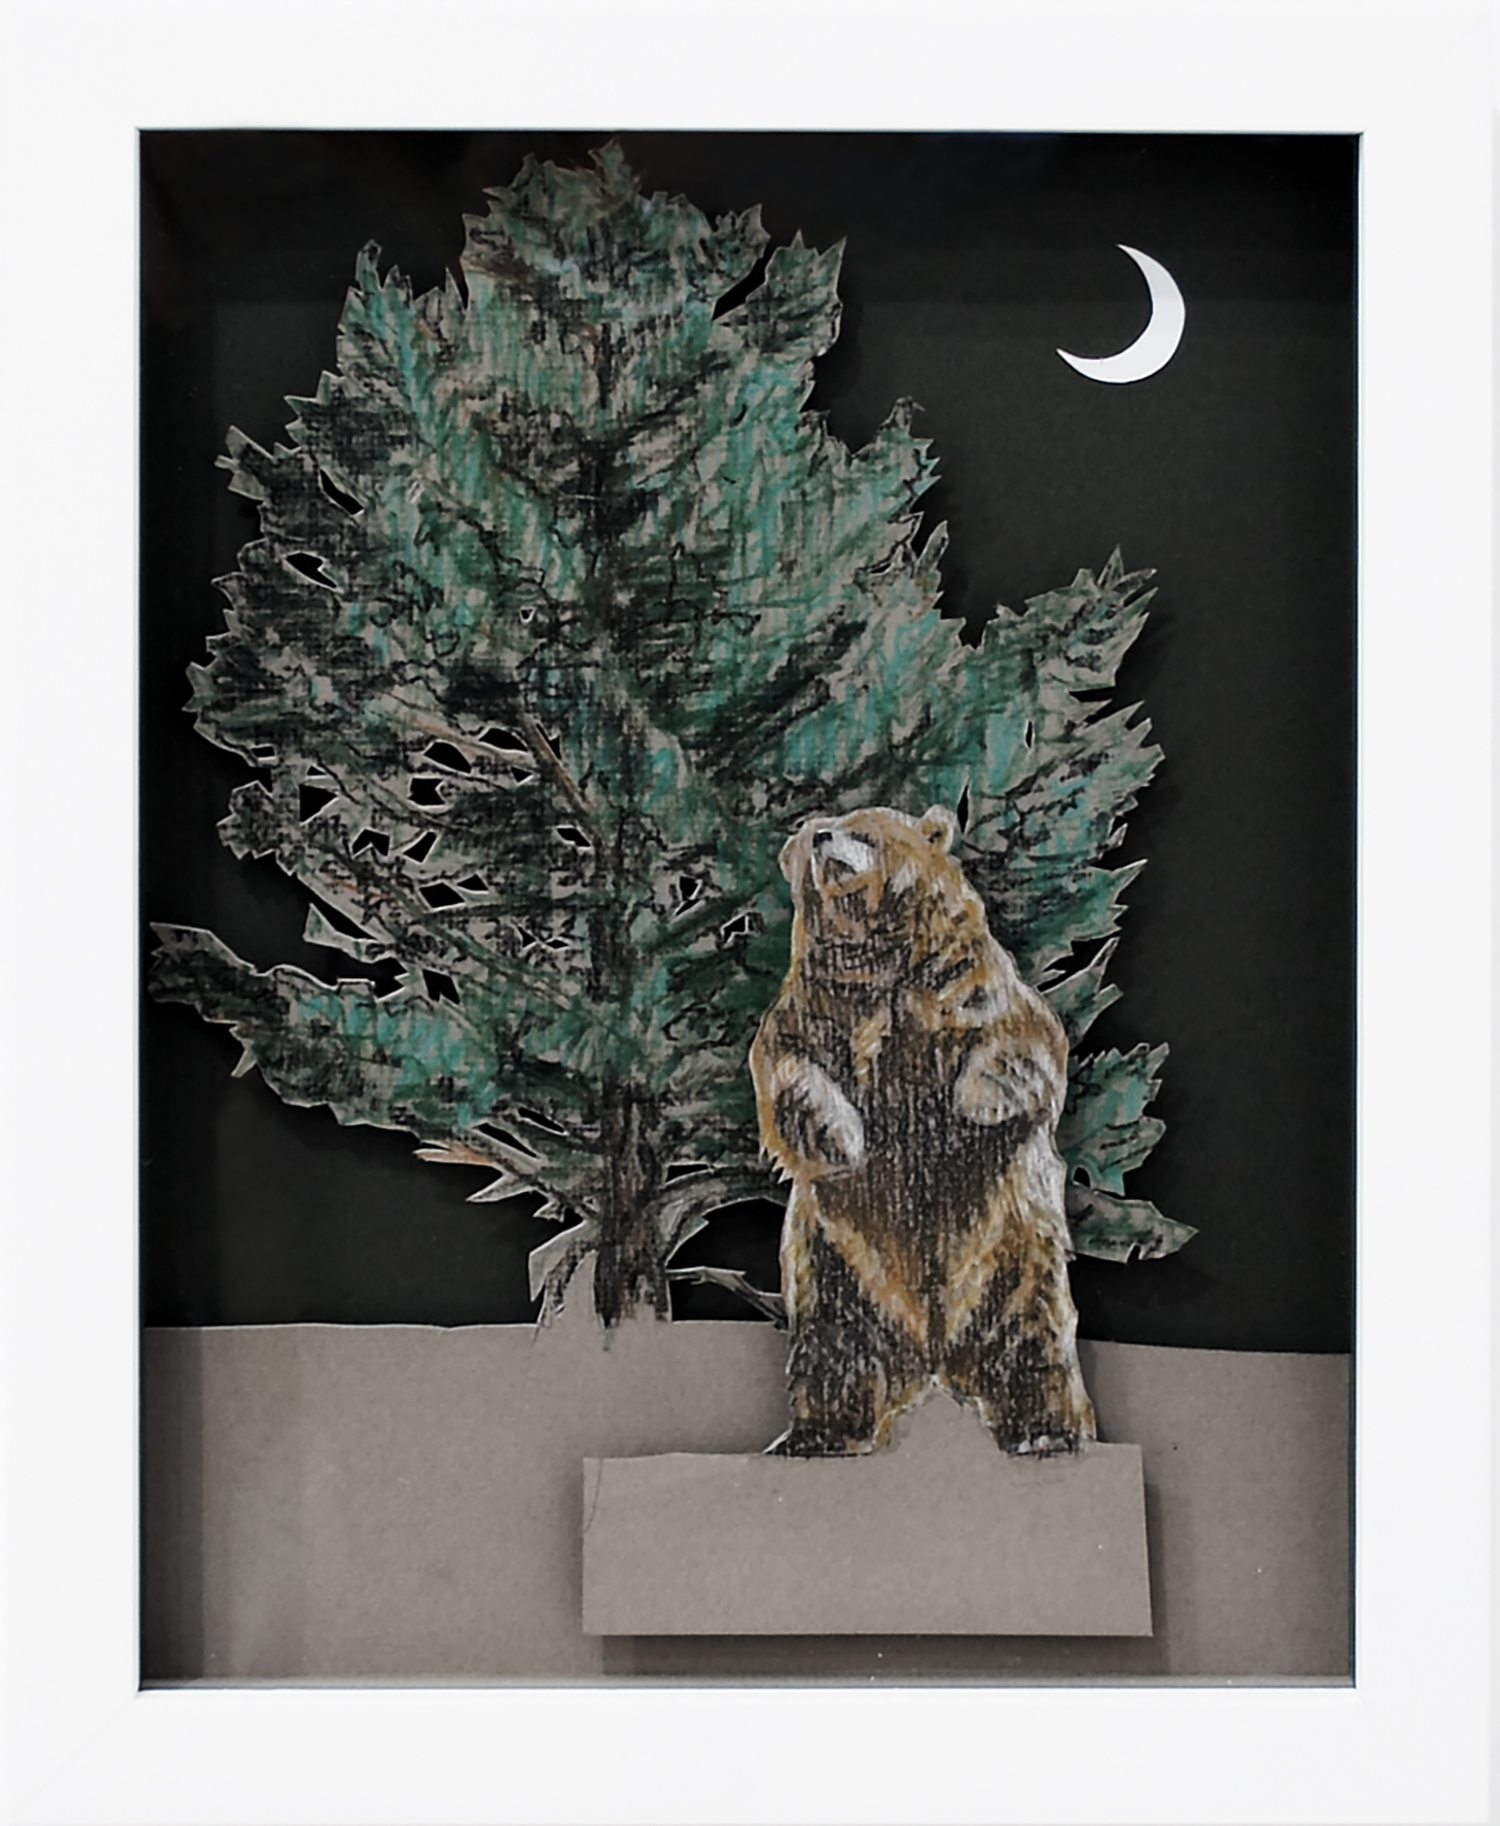 Rearing Brown Bear, 2008, Pastel on card, 24 x 30 x 3.8 cm